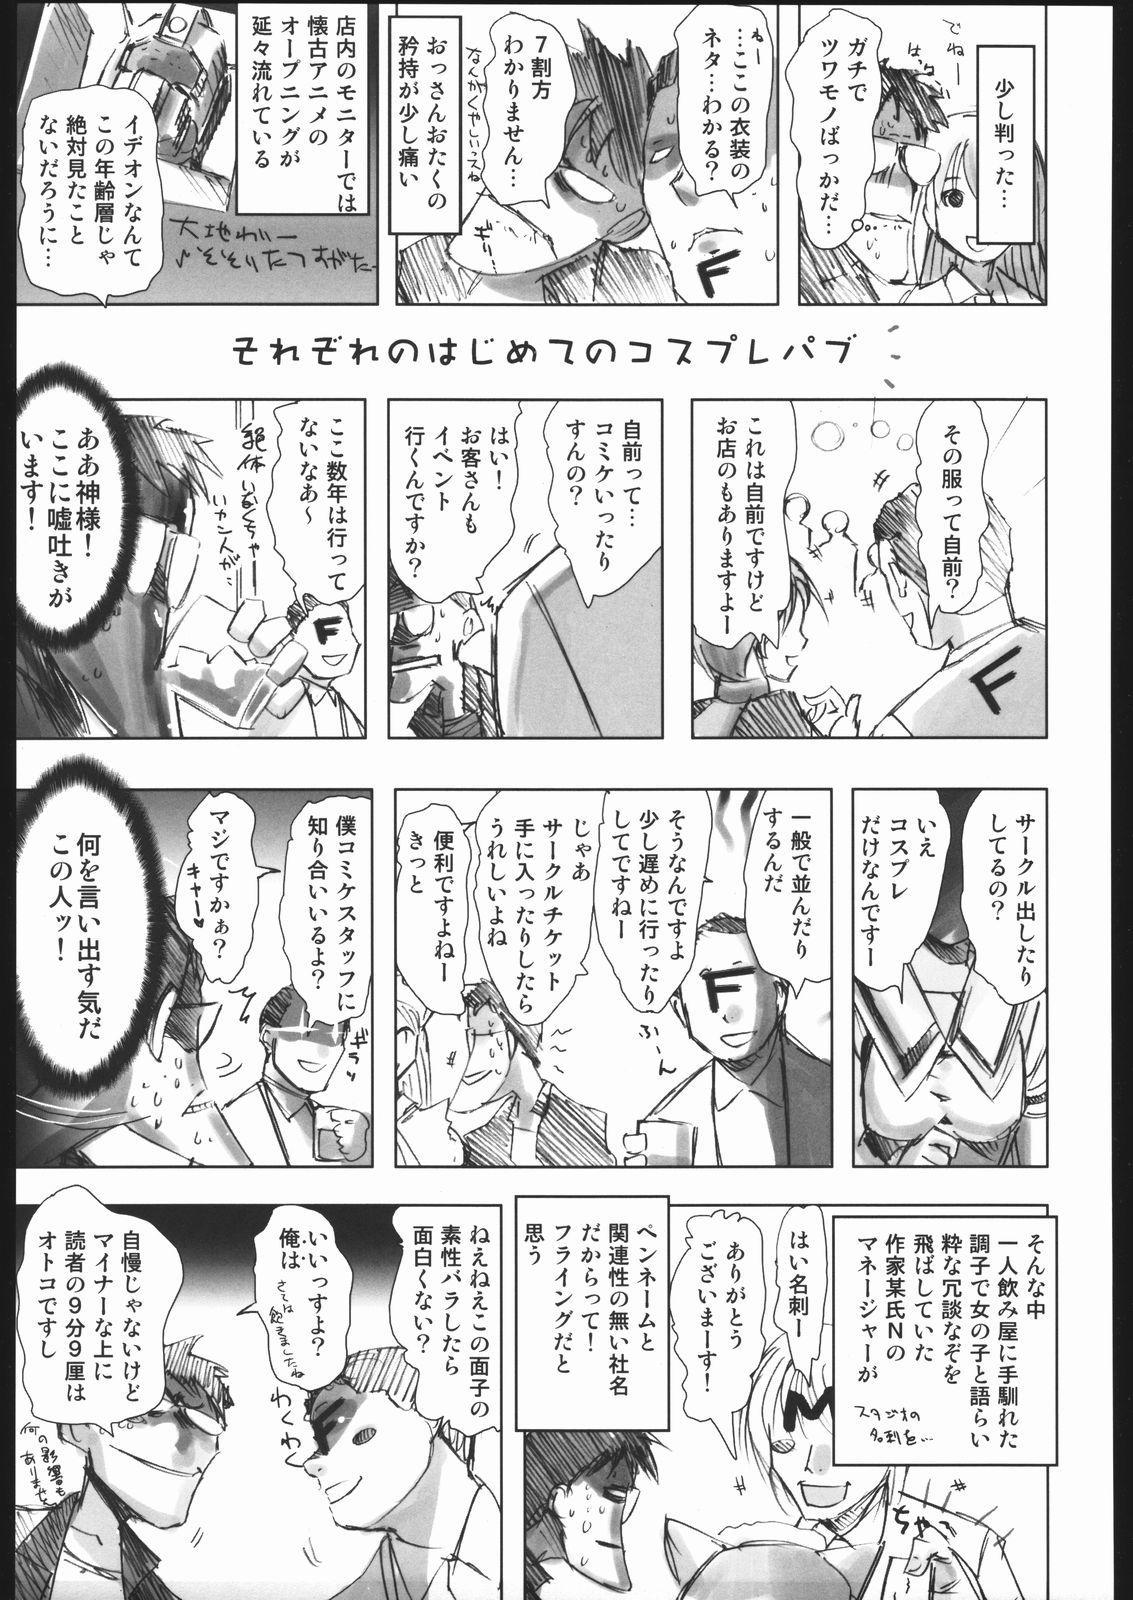 Adachi Misemono Club 206